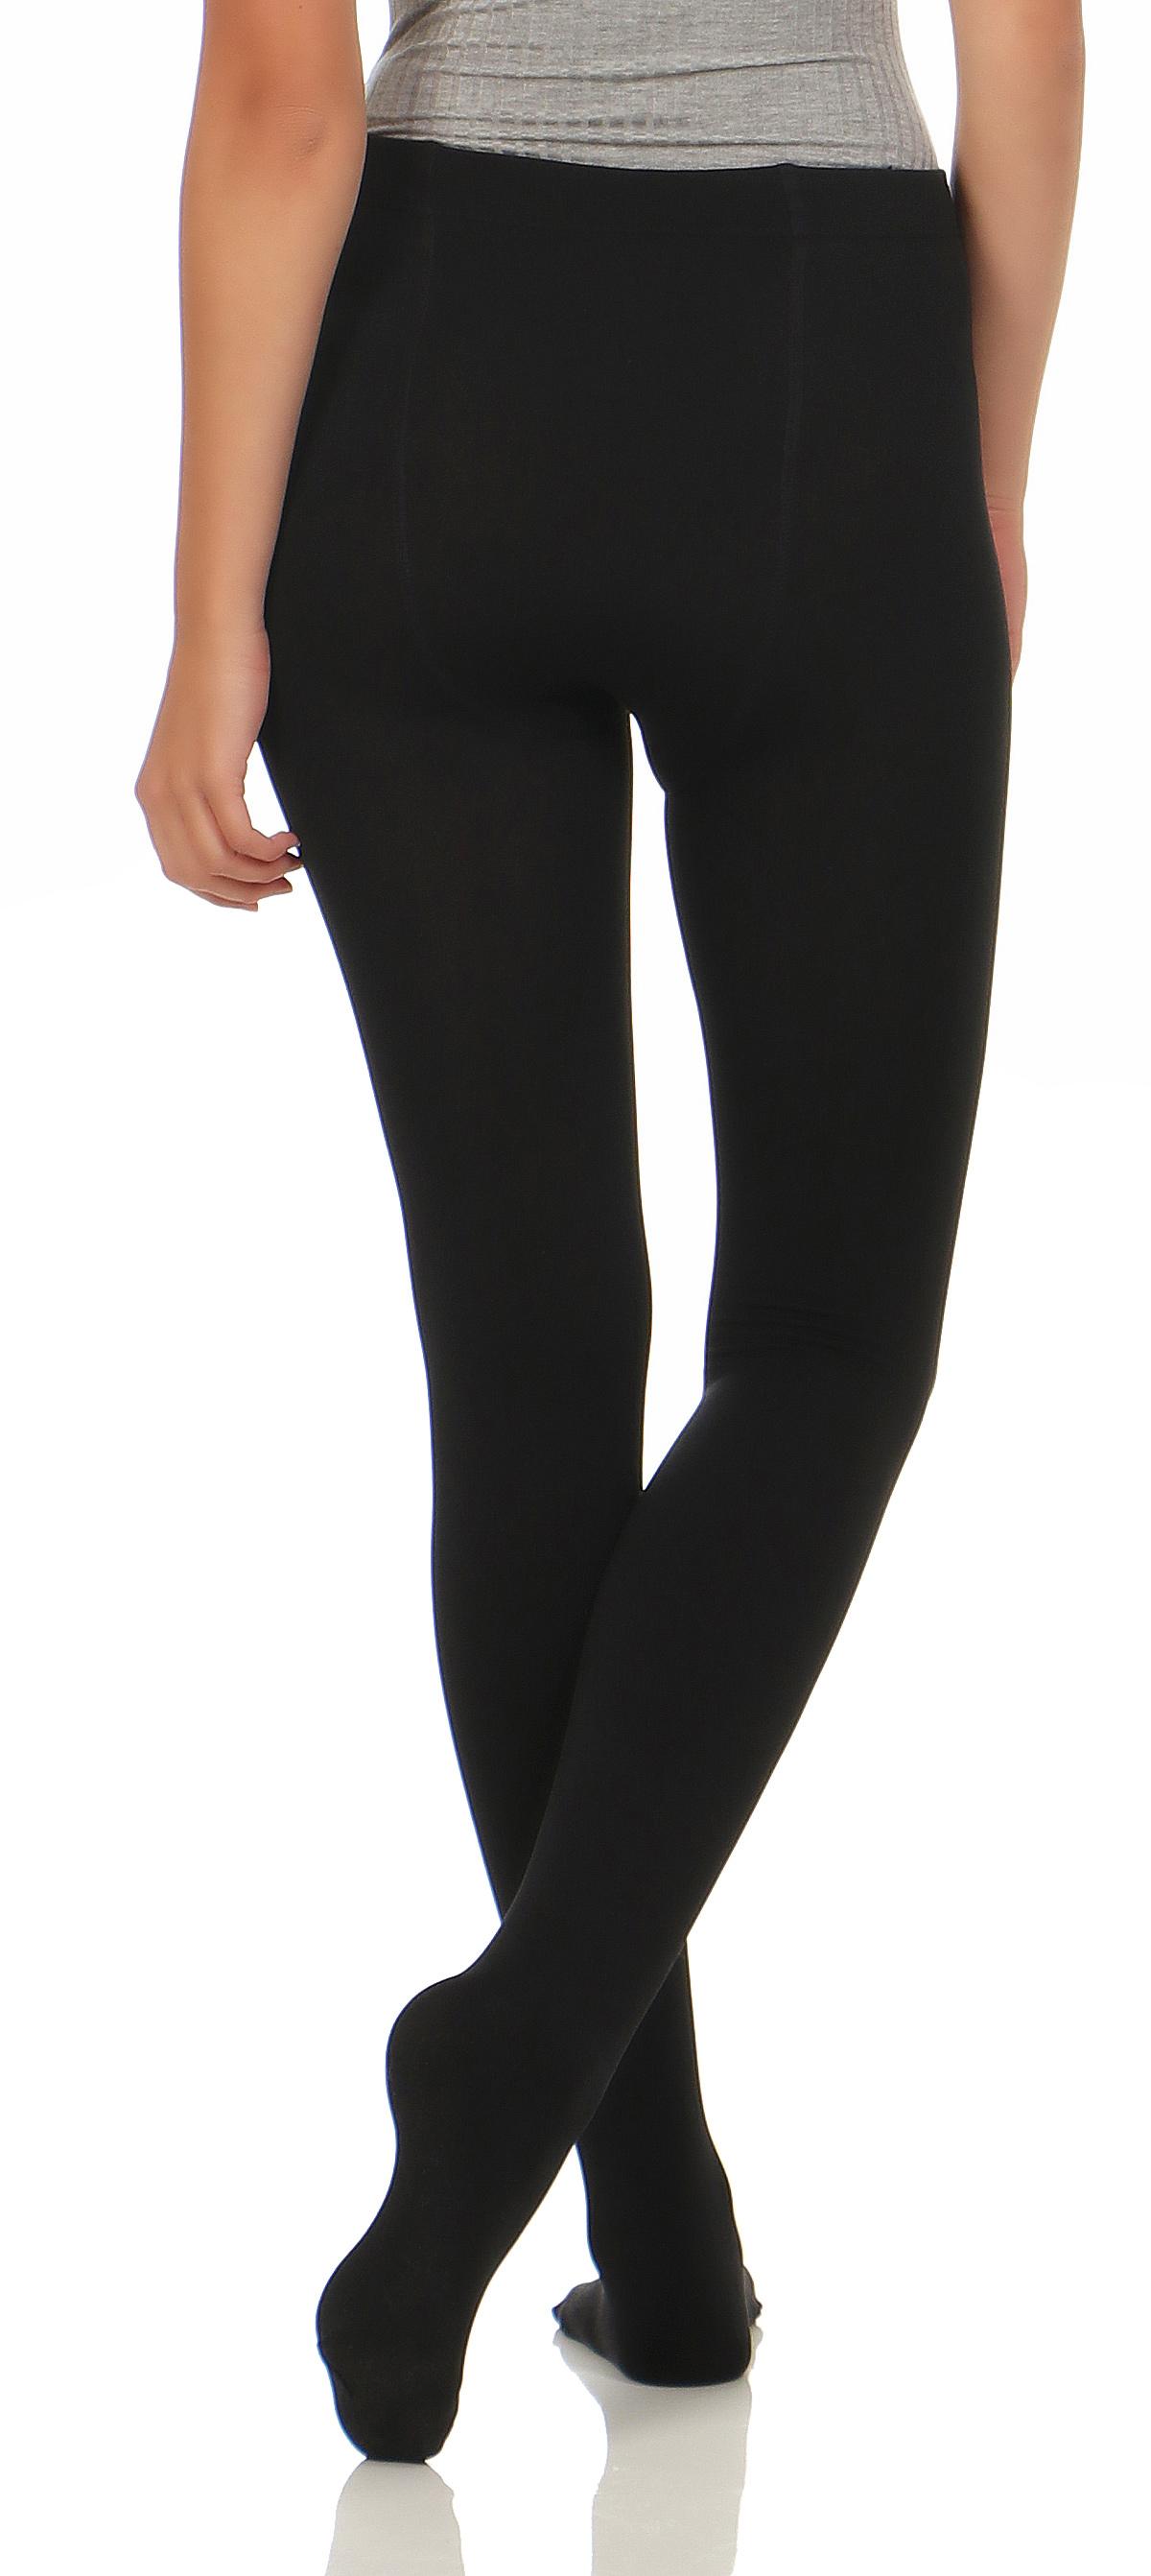 2er pack damen thermo strumpfhosen leggings hose pants mit. Black Bedroom Furniture Sets. Home Design Ideas